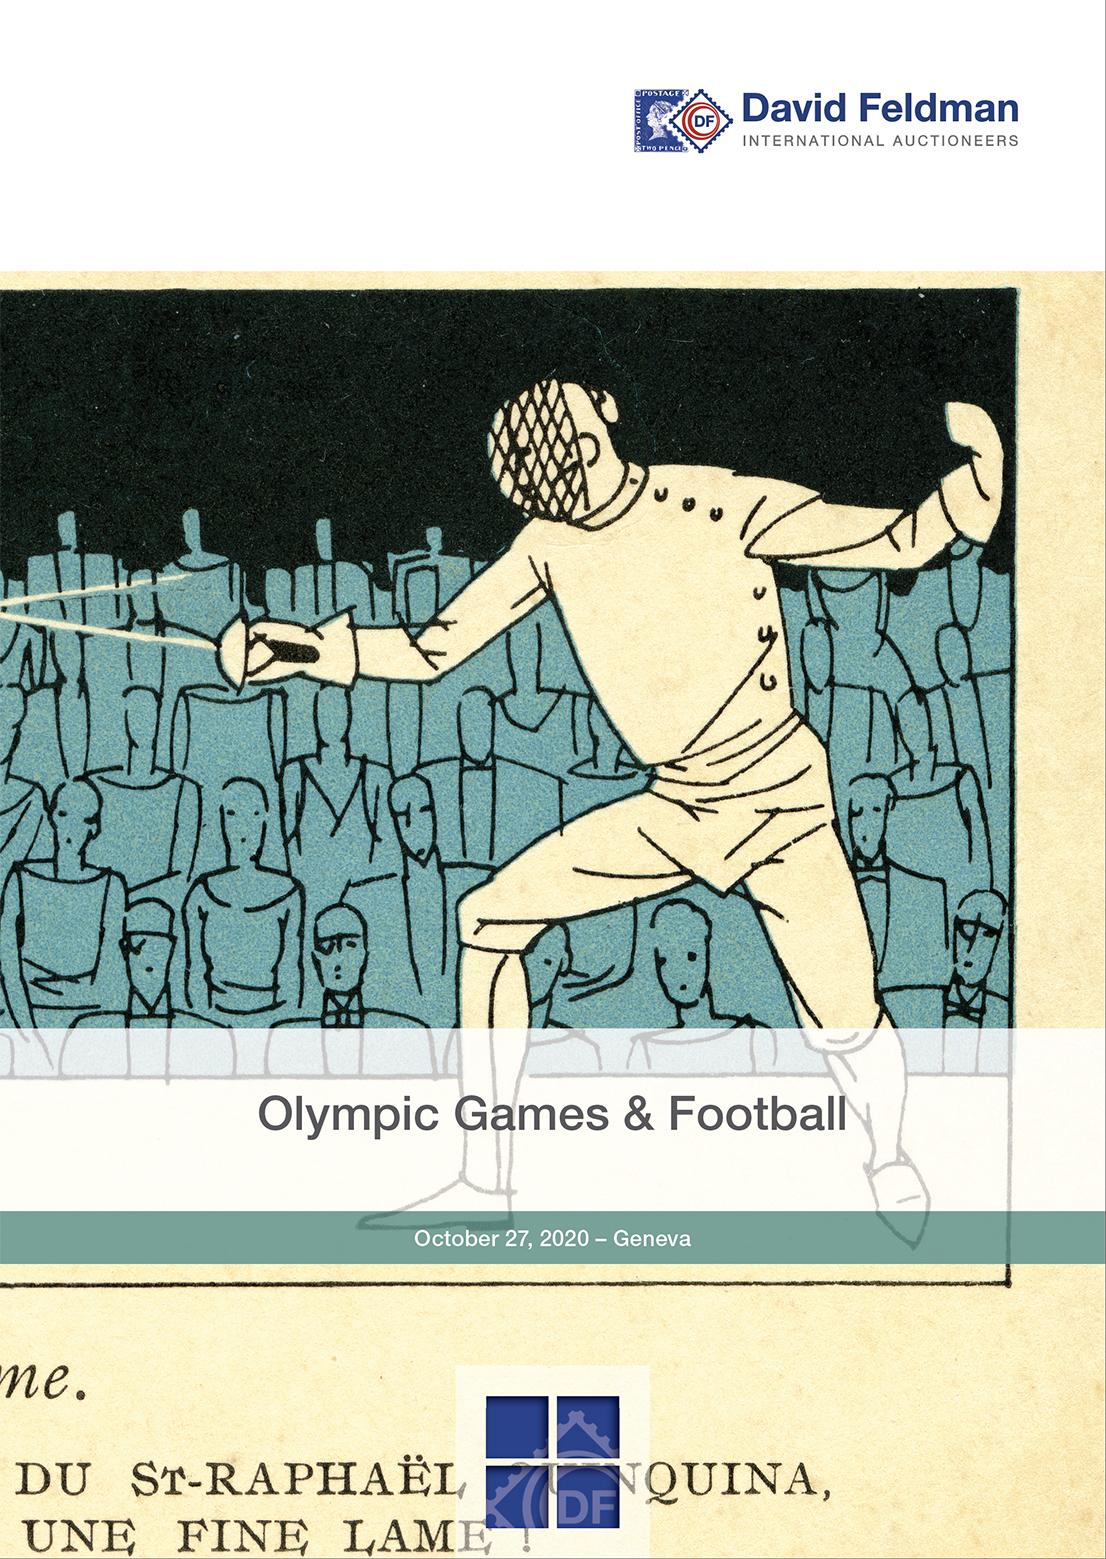 Olympic philately & memorabilia auction